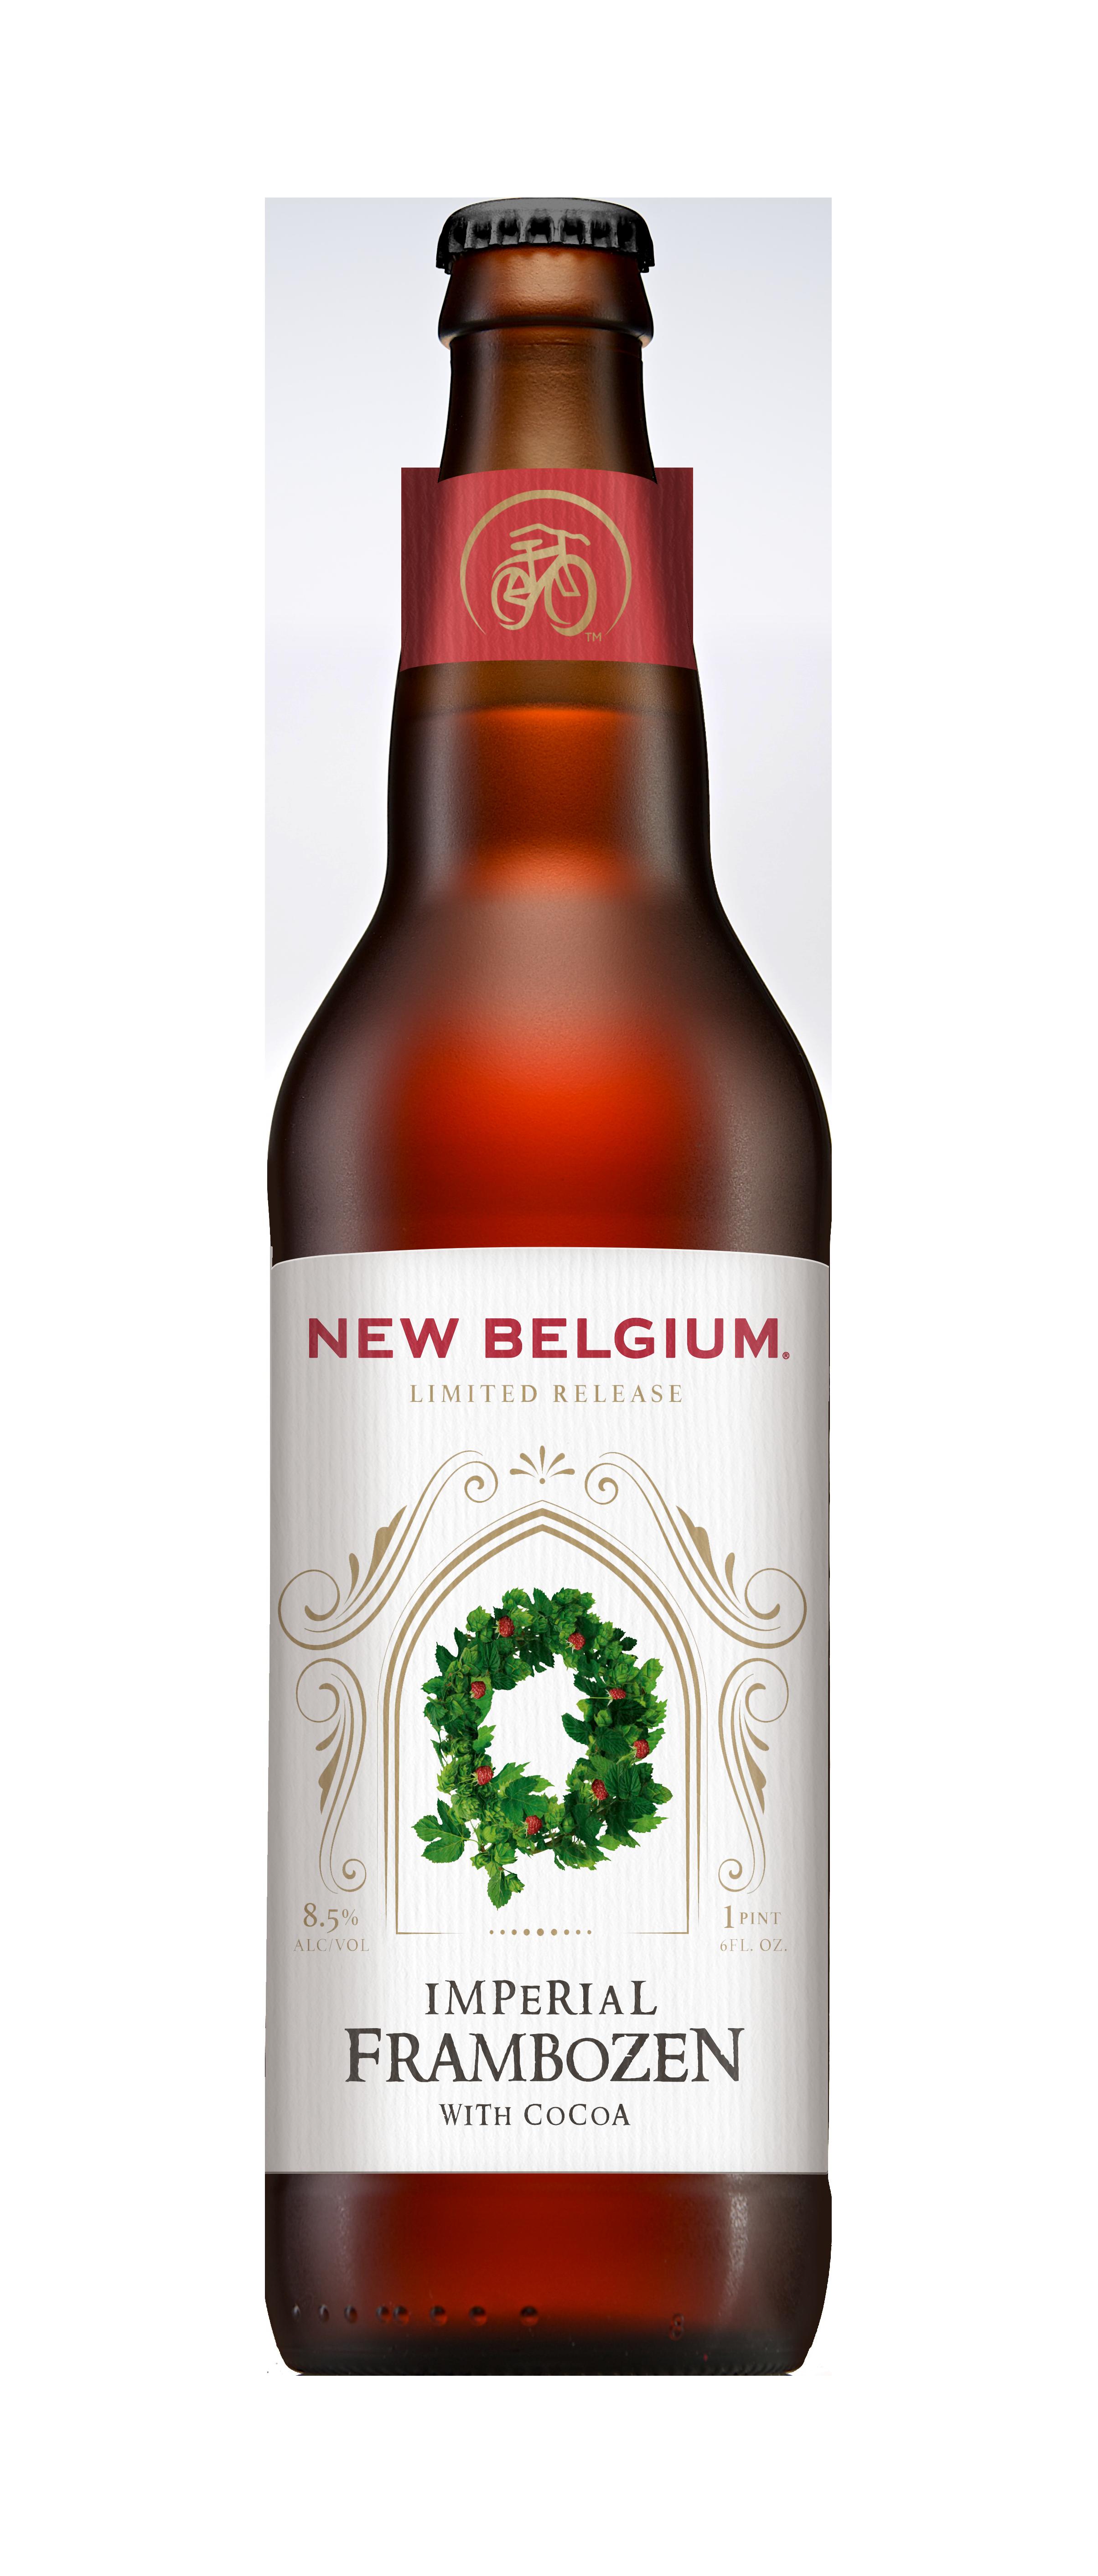 New Belgium Releases Imperial Frambozen With Cocoa